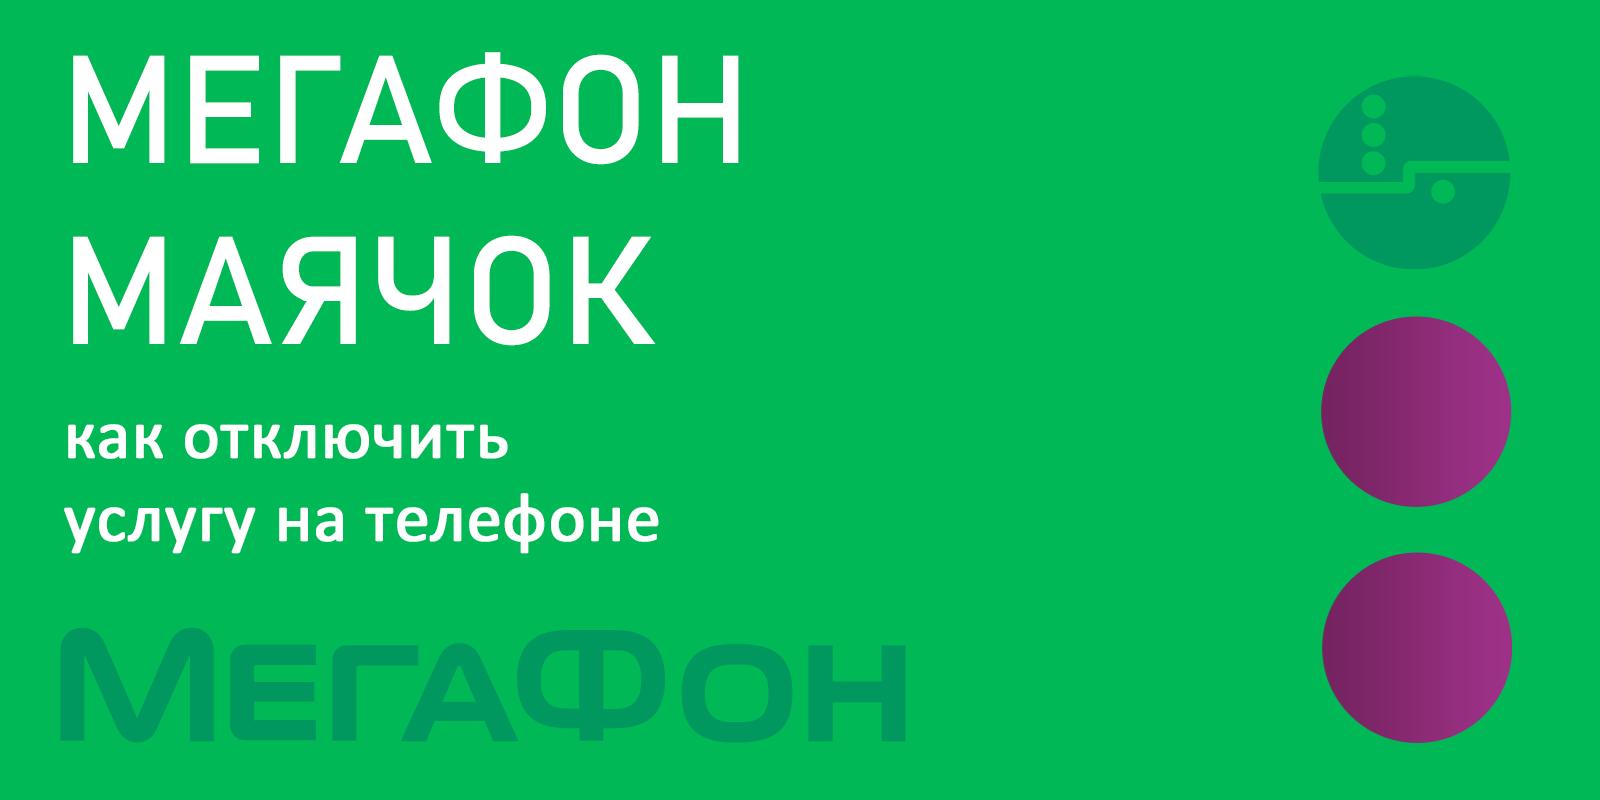 Мегафон Маячок